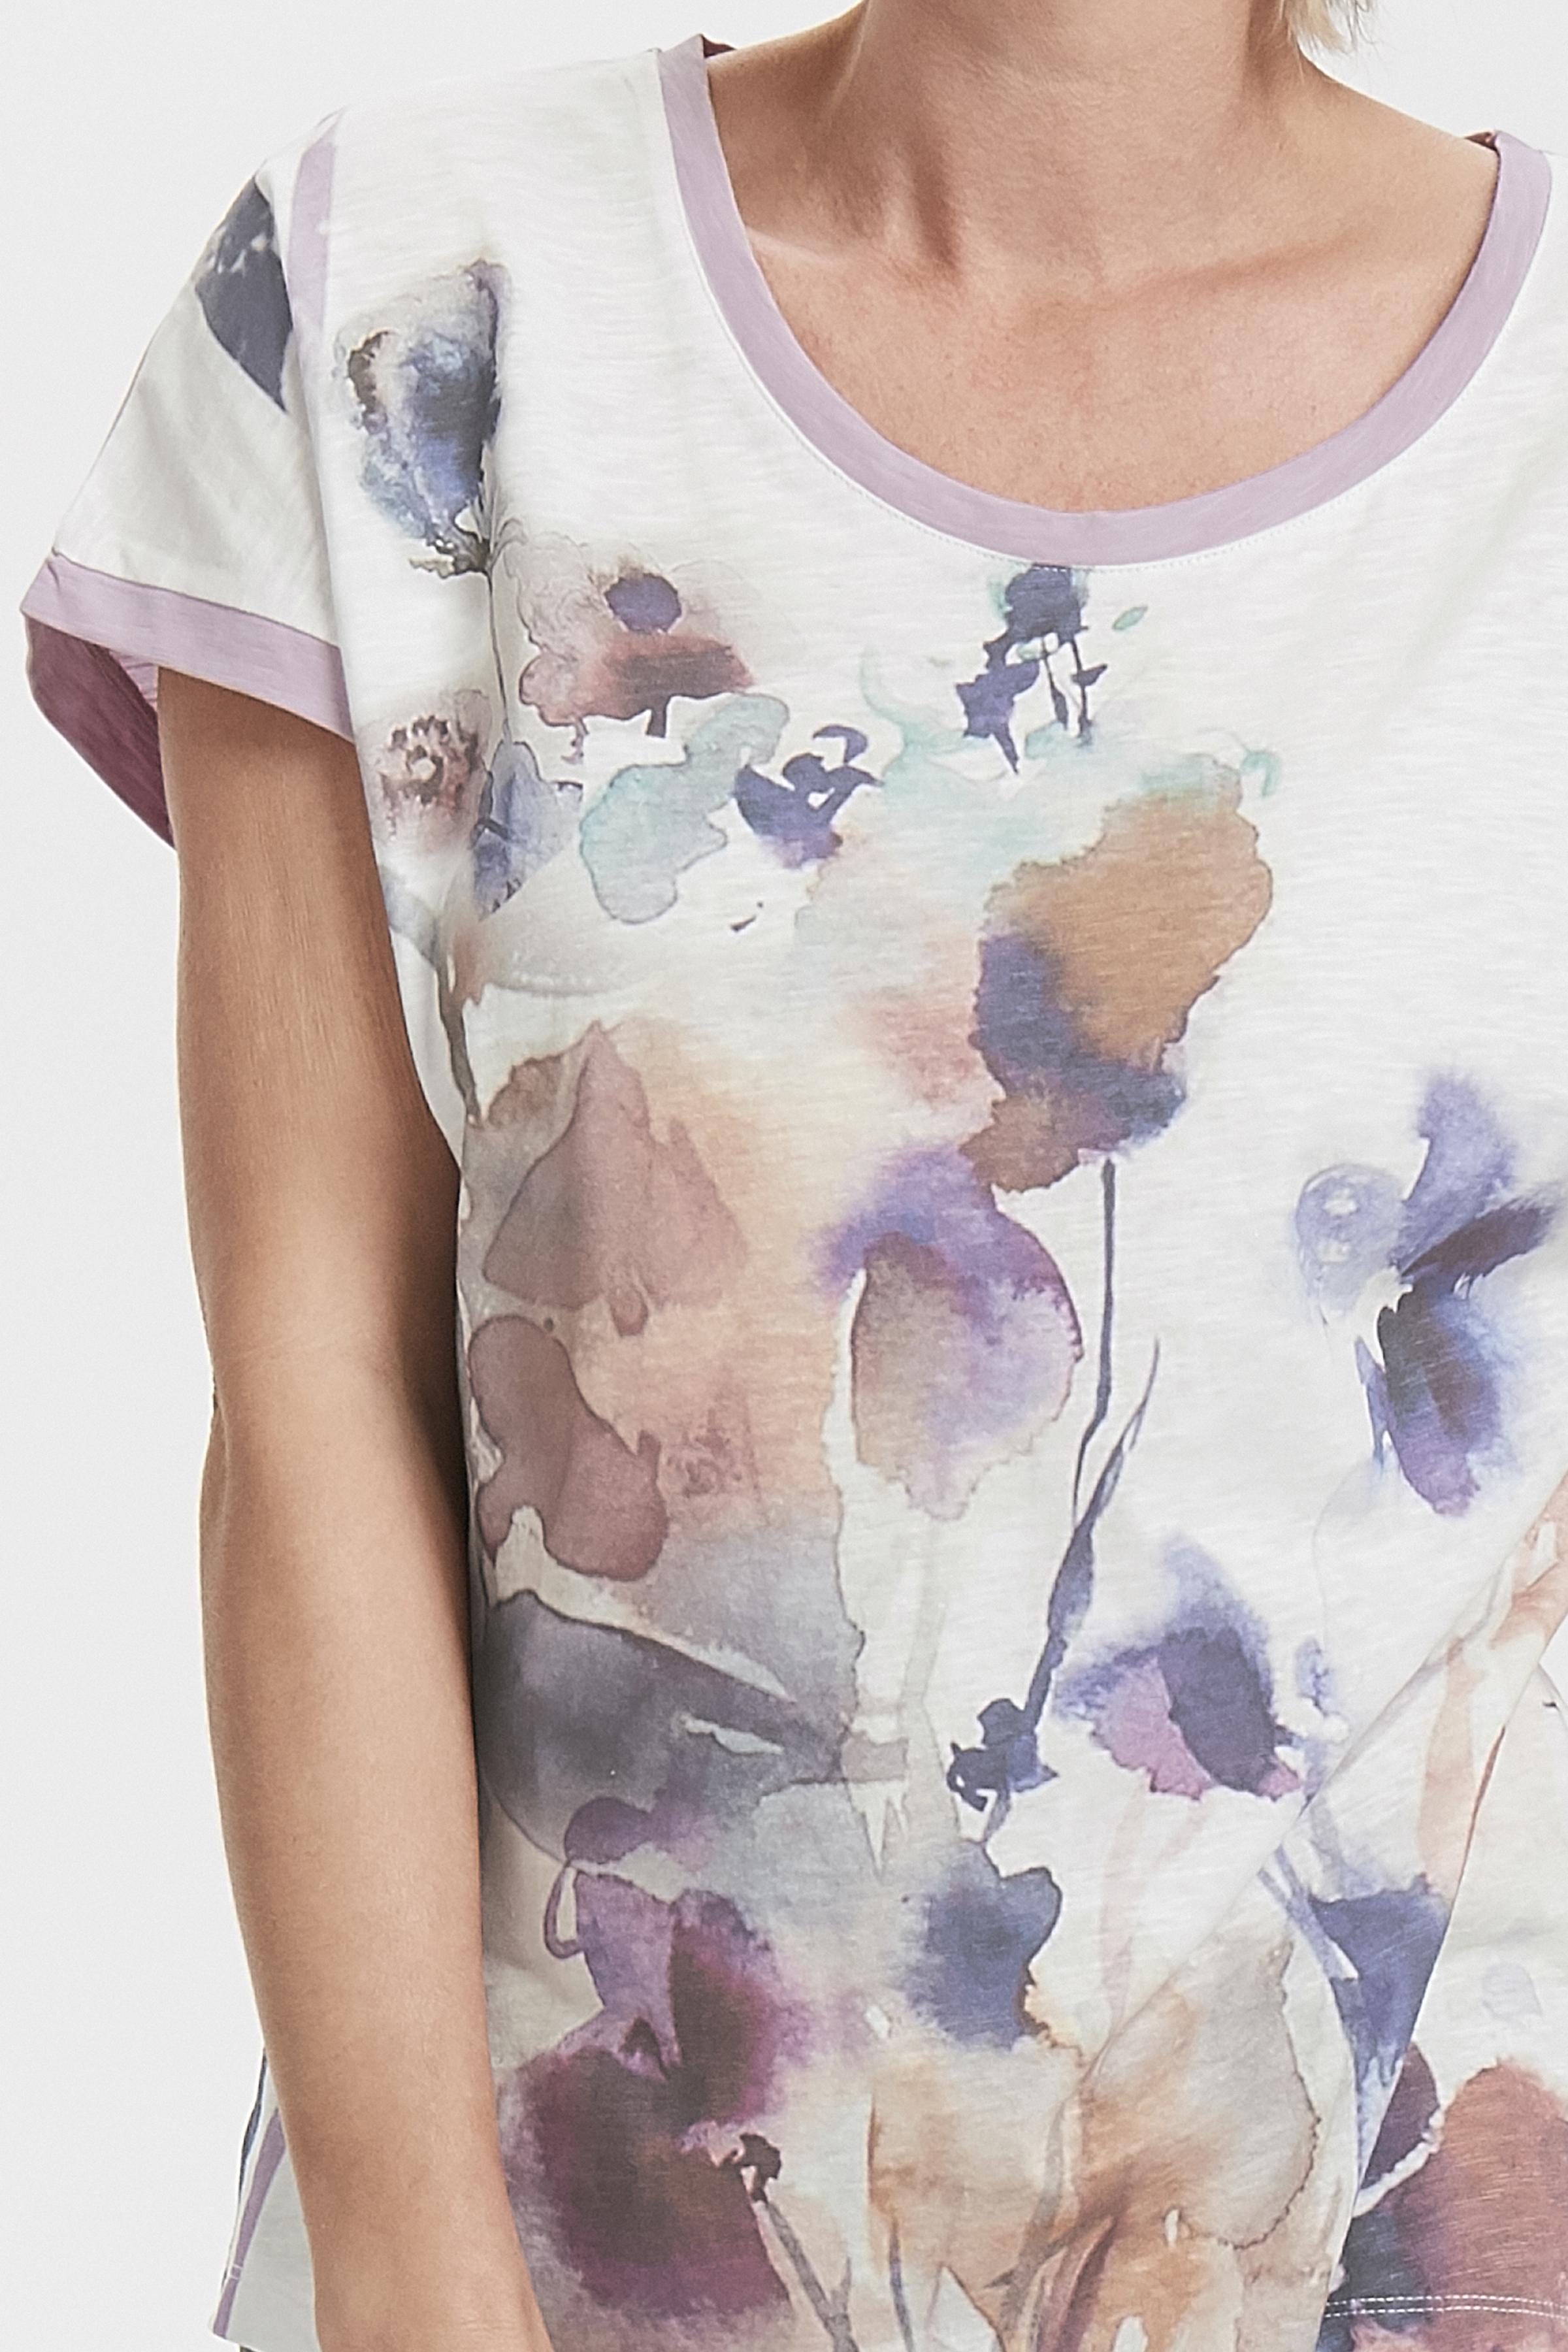 Off-white/ljus lila Kortärmad T-shirt från Cream – Köp Off-white/ljus lila Kortärmad T-shirt från stl. XS-XXL här